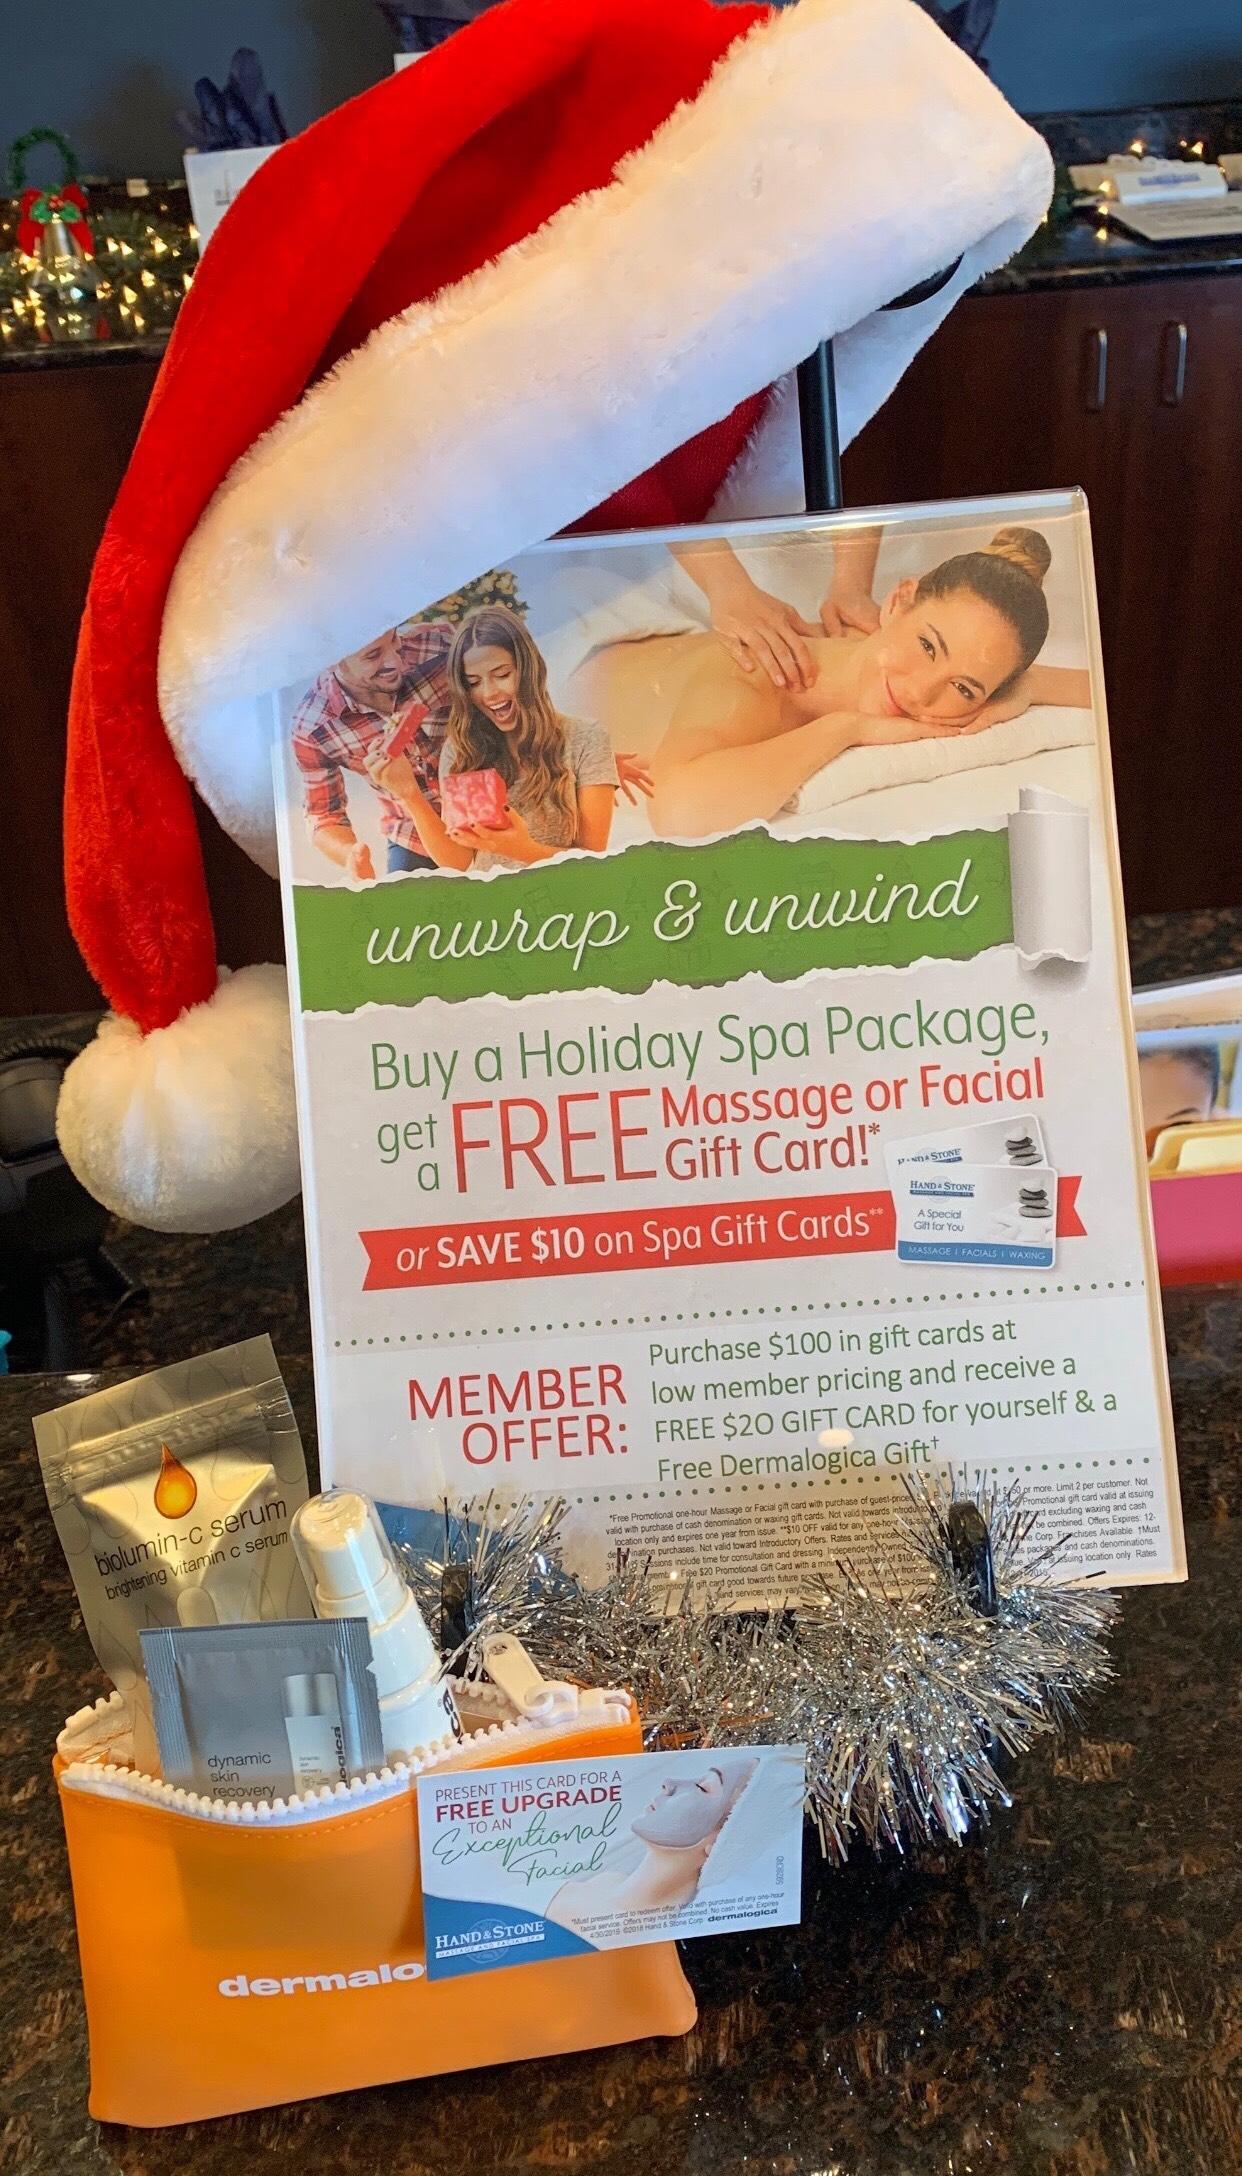 Unwrap & Unwind this Holiday Season!